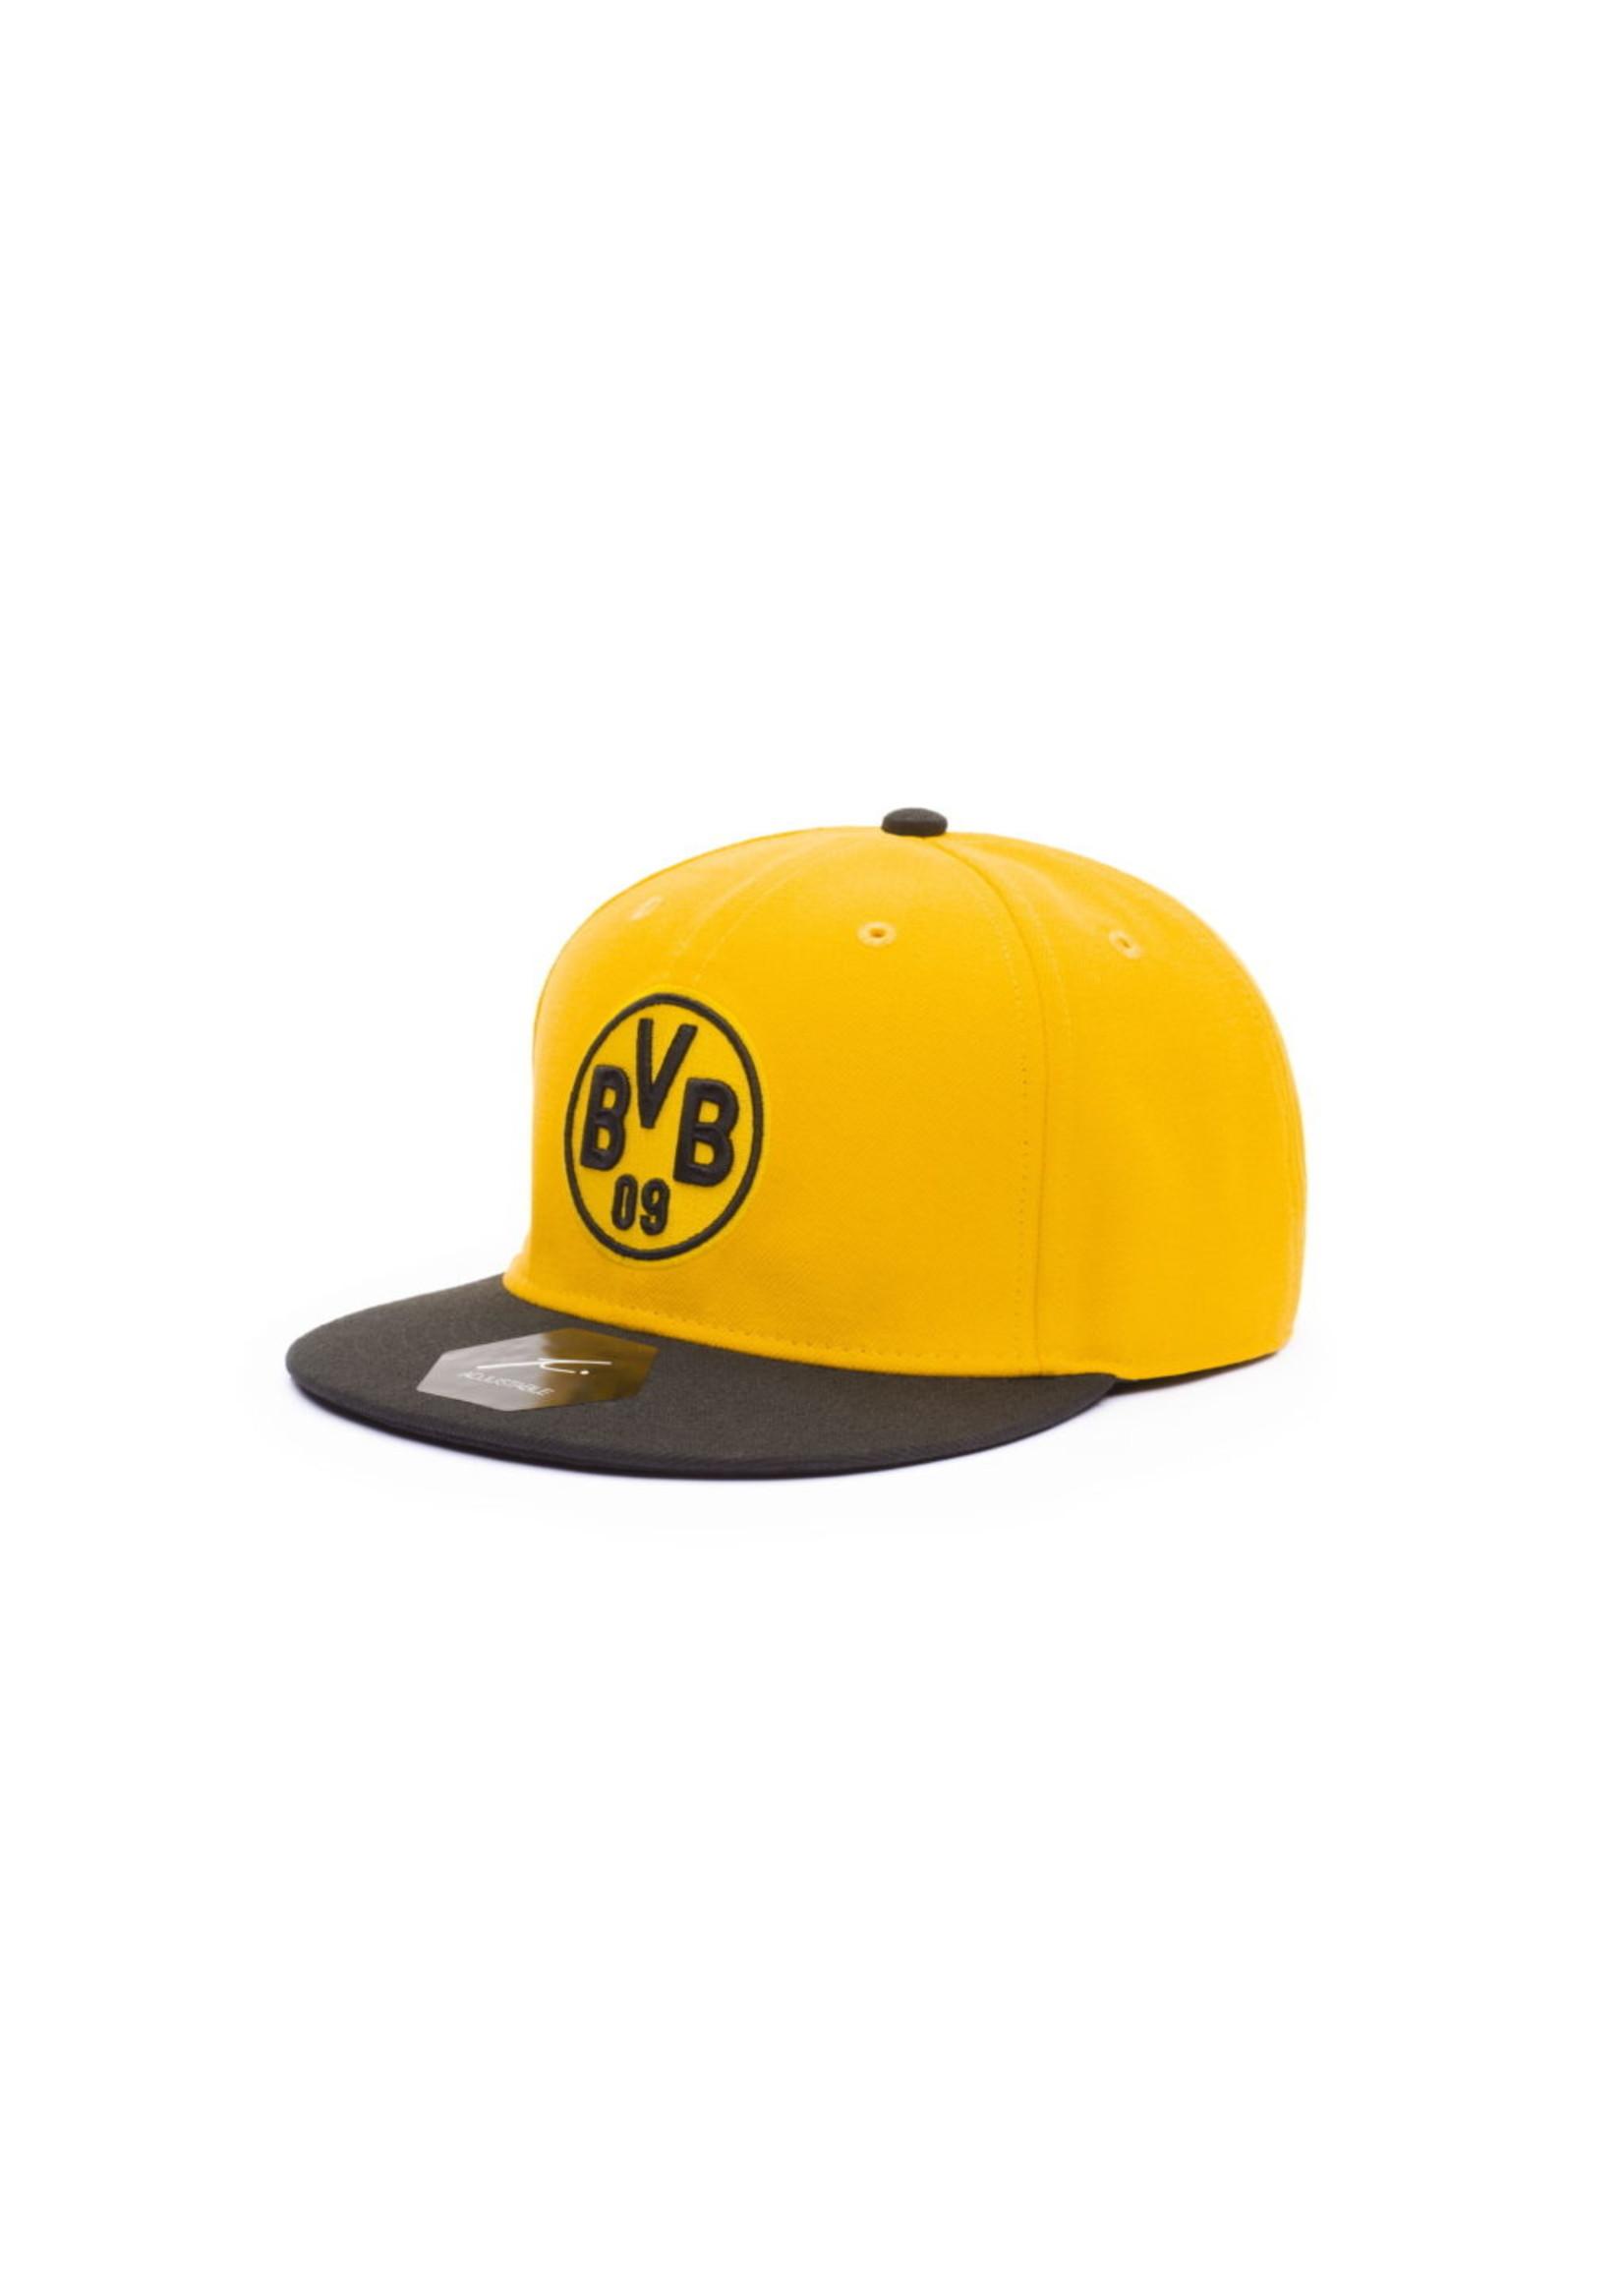 Borussia Dortmund Team Snapback Hat